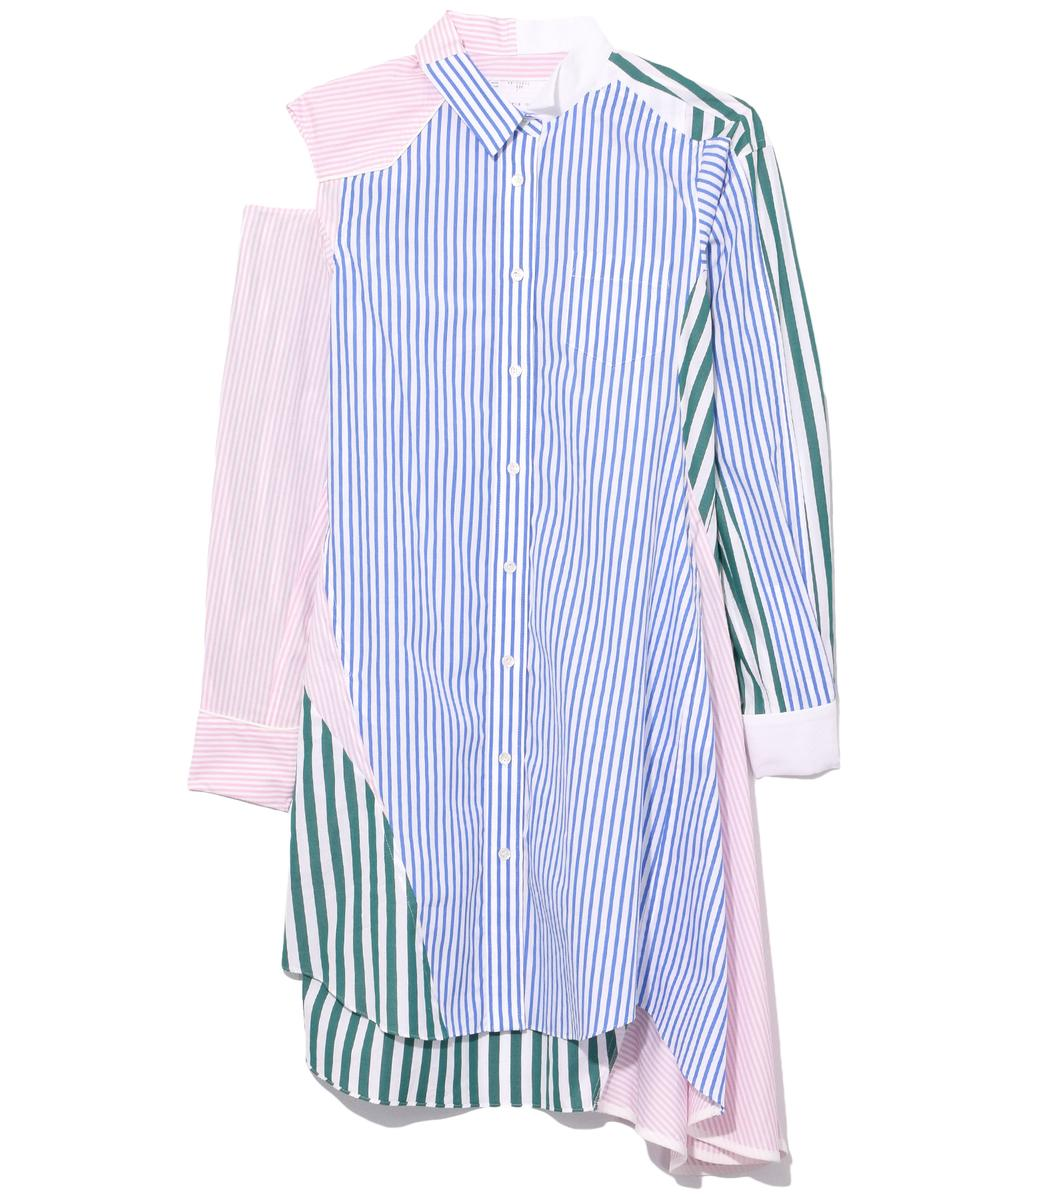 f8c2937338b26 Sacai Cutout Patchwork Striped Cotton-Poplin Shirt Dress In Multicolor